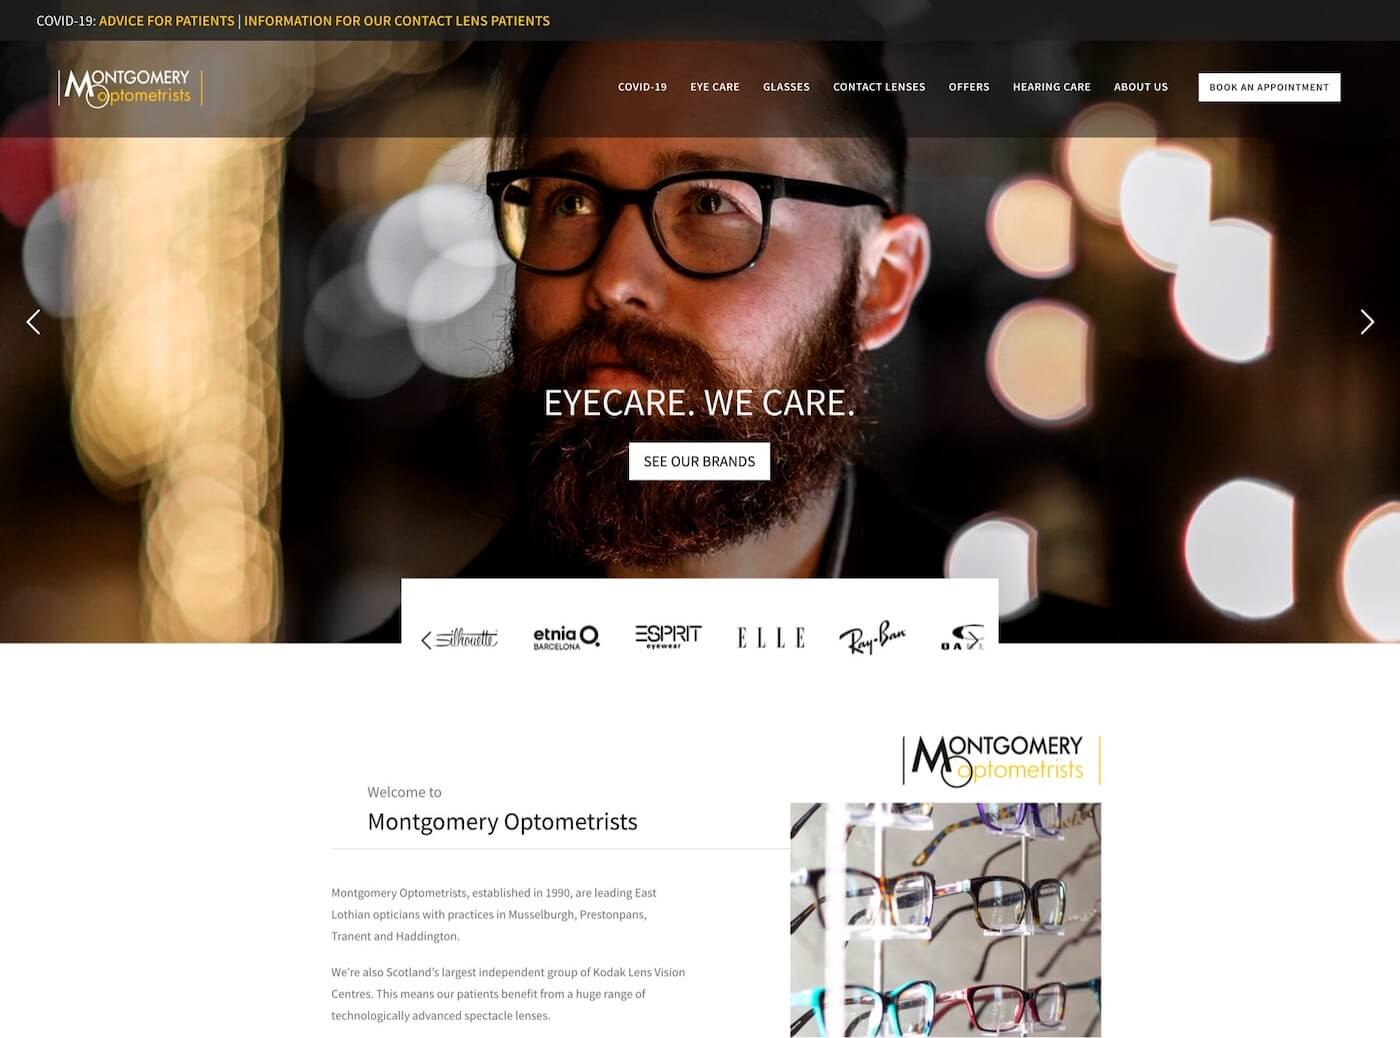 Web design for Montgomery Optometrists, Haddington, East Lothian